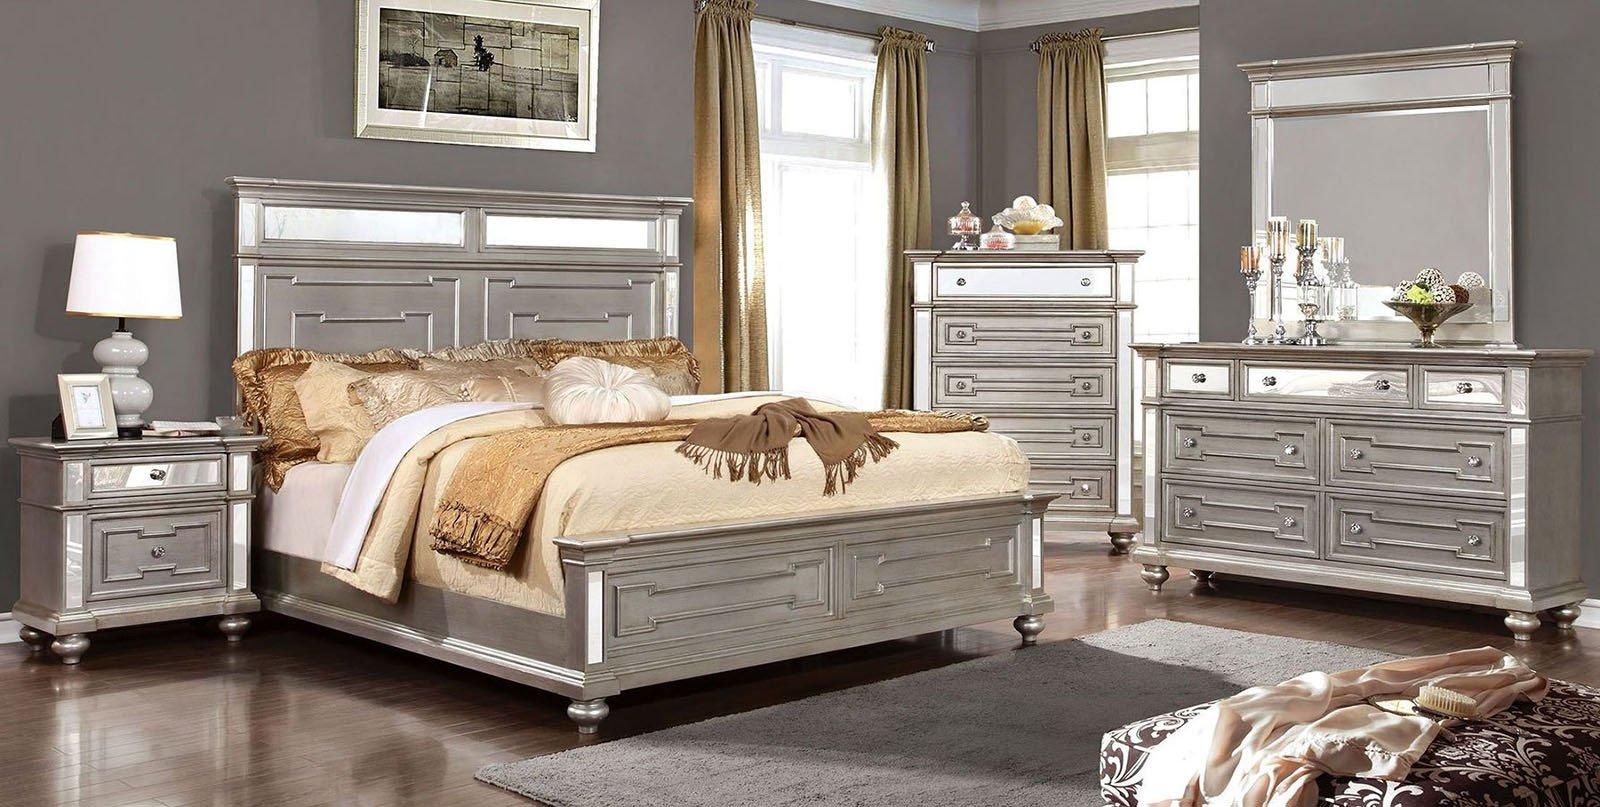 Paula Deen Steel Magnolia Bedroom Set Lovely Furniture Of America Salamanca 4pc Panel Bedroom Set In Champagne